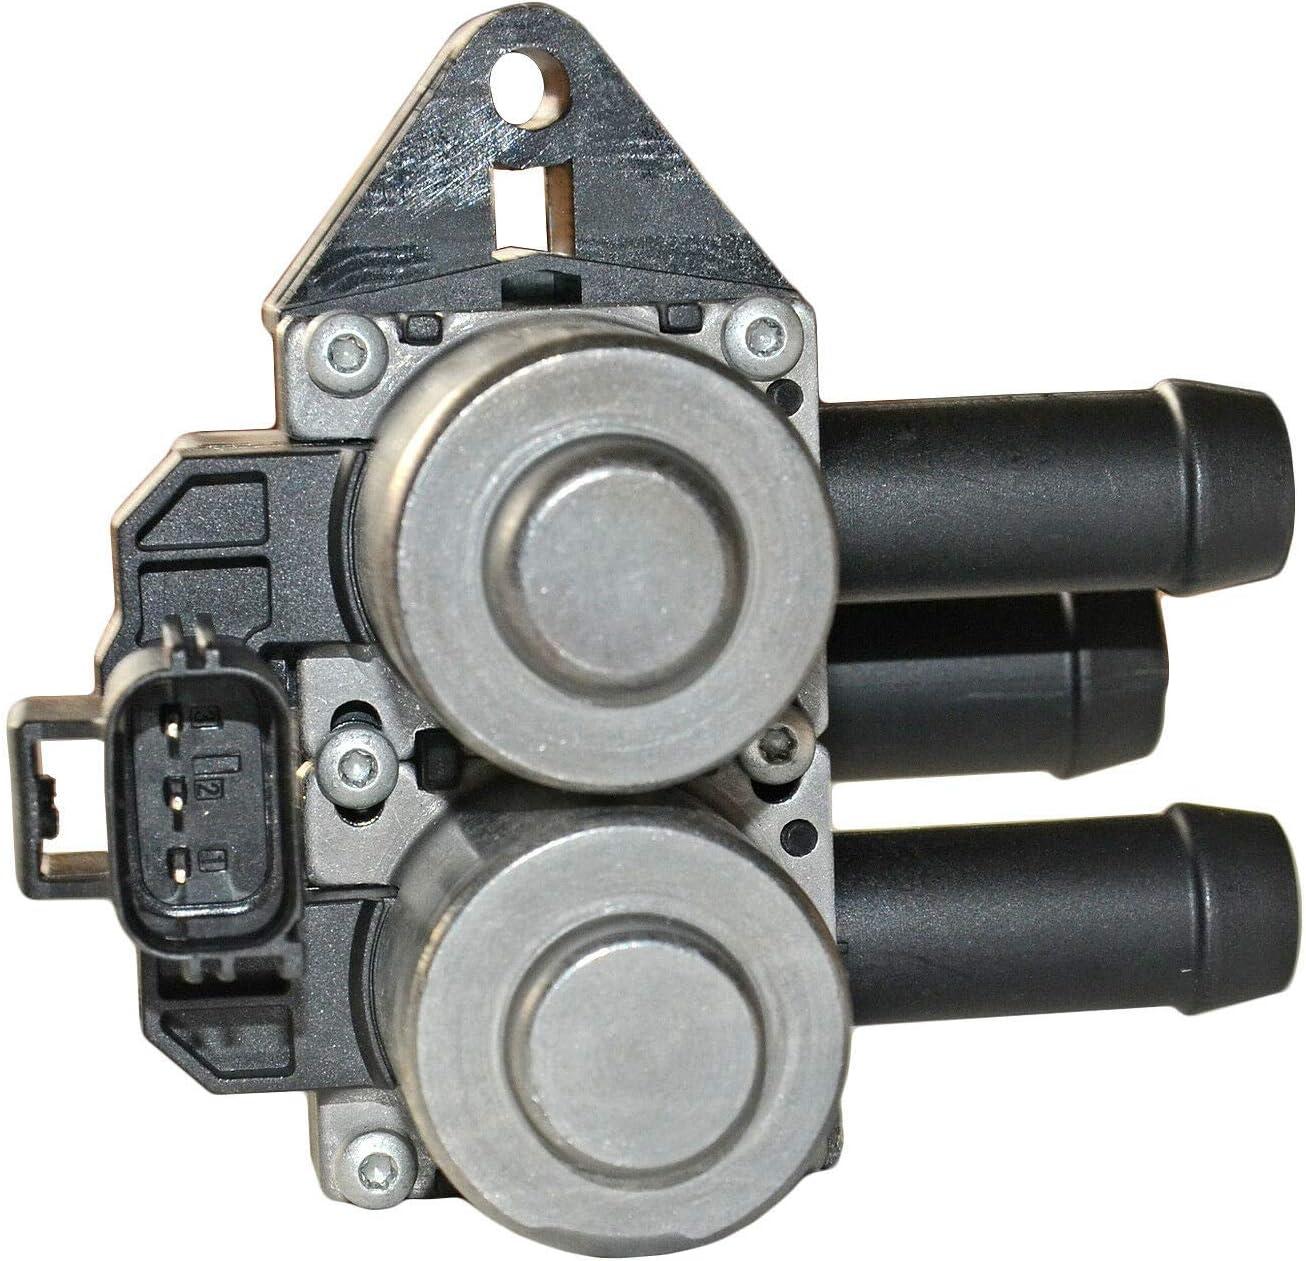 XR840091 Car Heater Control Solenoid Water Valve for Jaguar S-Type 2003-2008